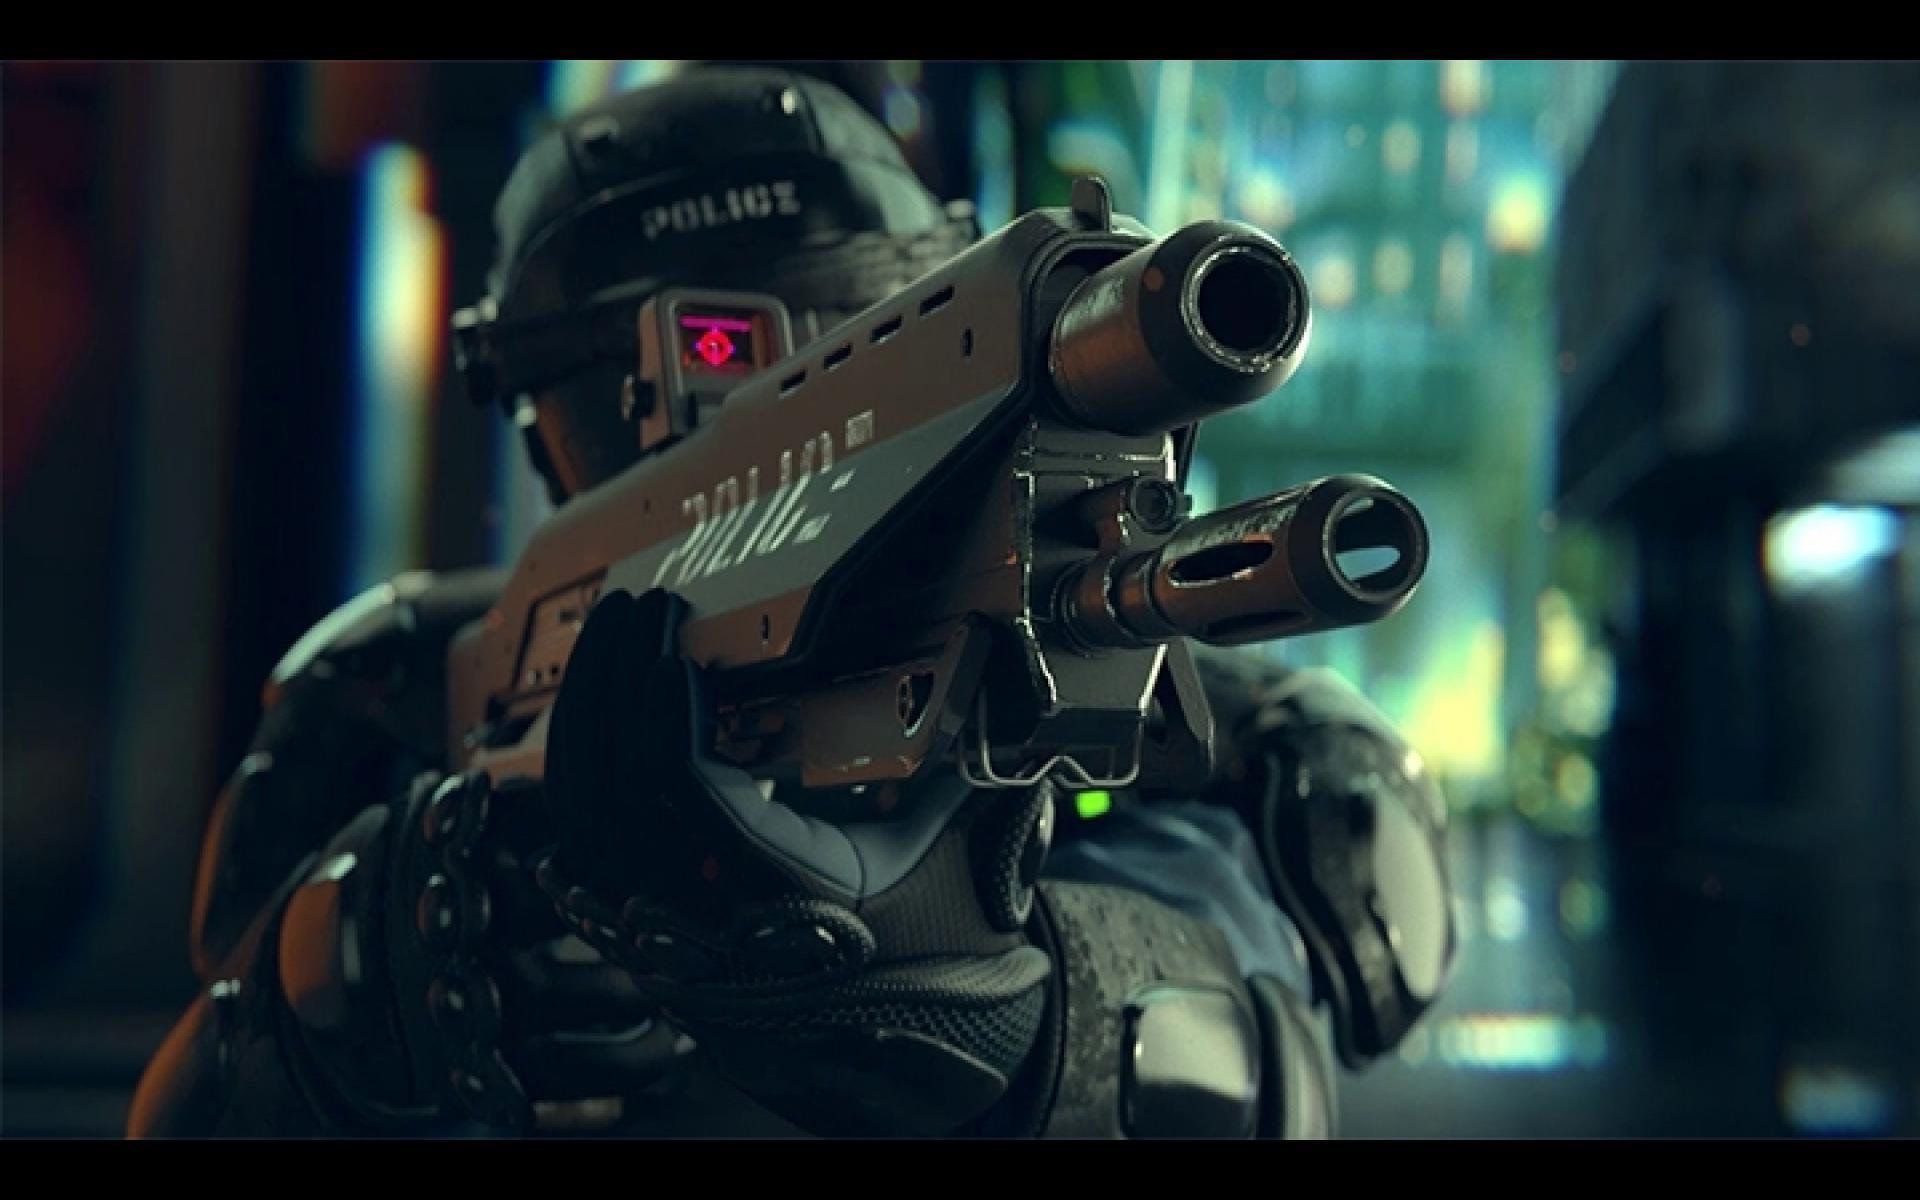 Cyberpunk 2077 Wallpapers Hd: 20+ Free Cyberpunk 2077 HD Wallpapers To Download